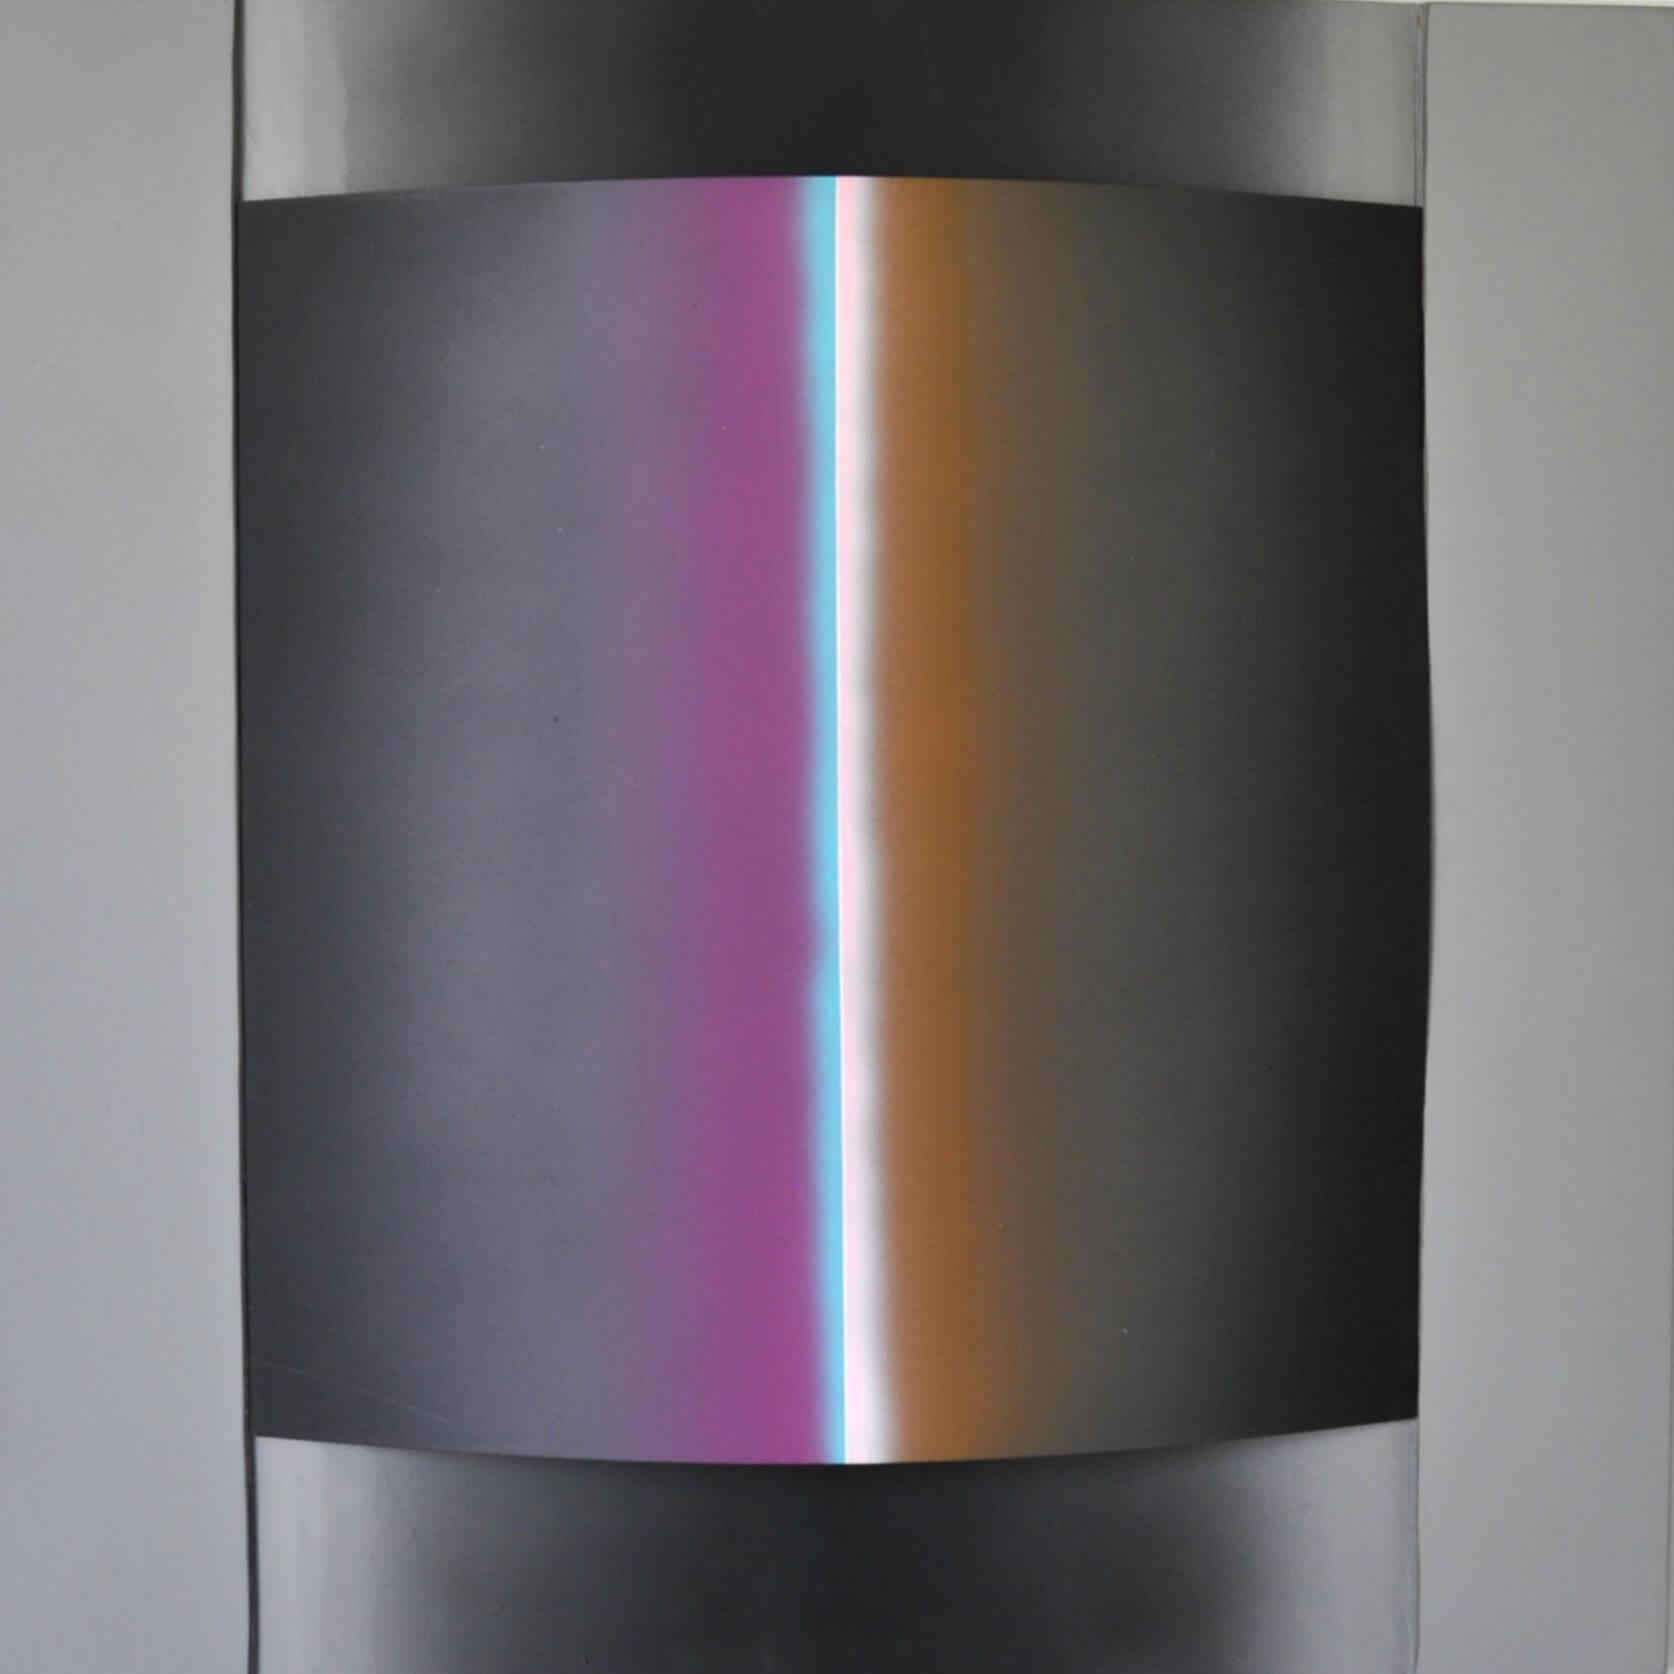 Riflessi, 2001 – Jorrit Tornquist